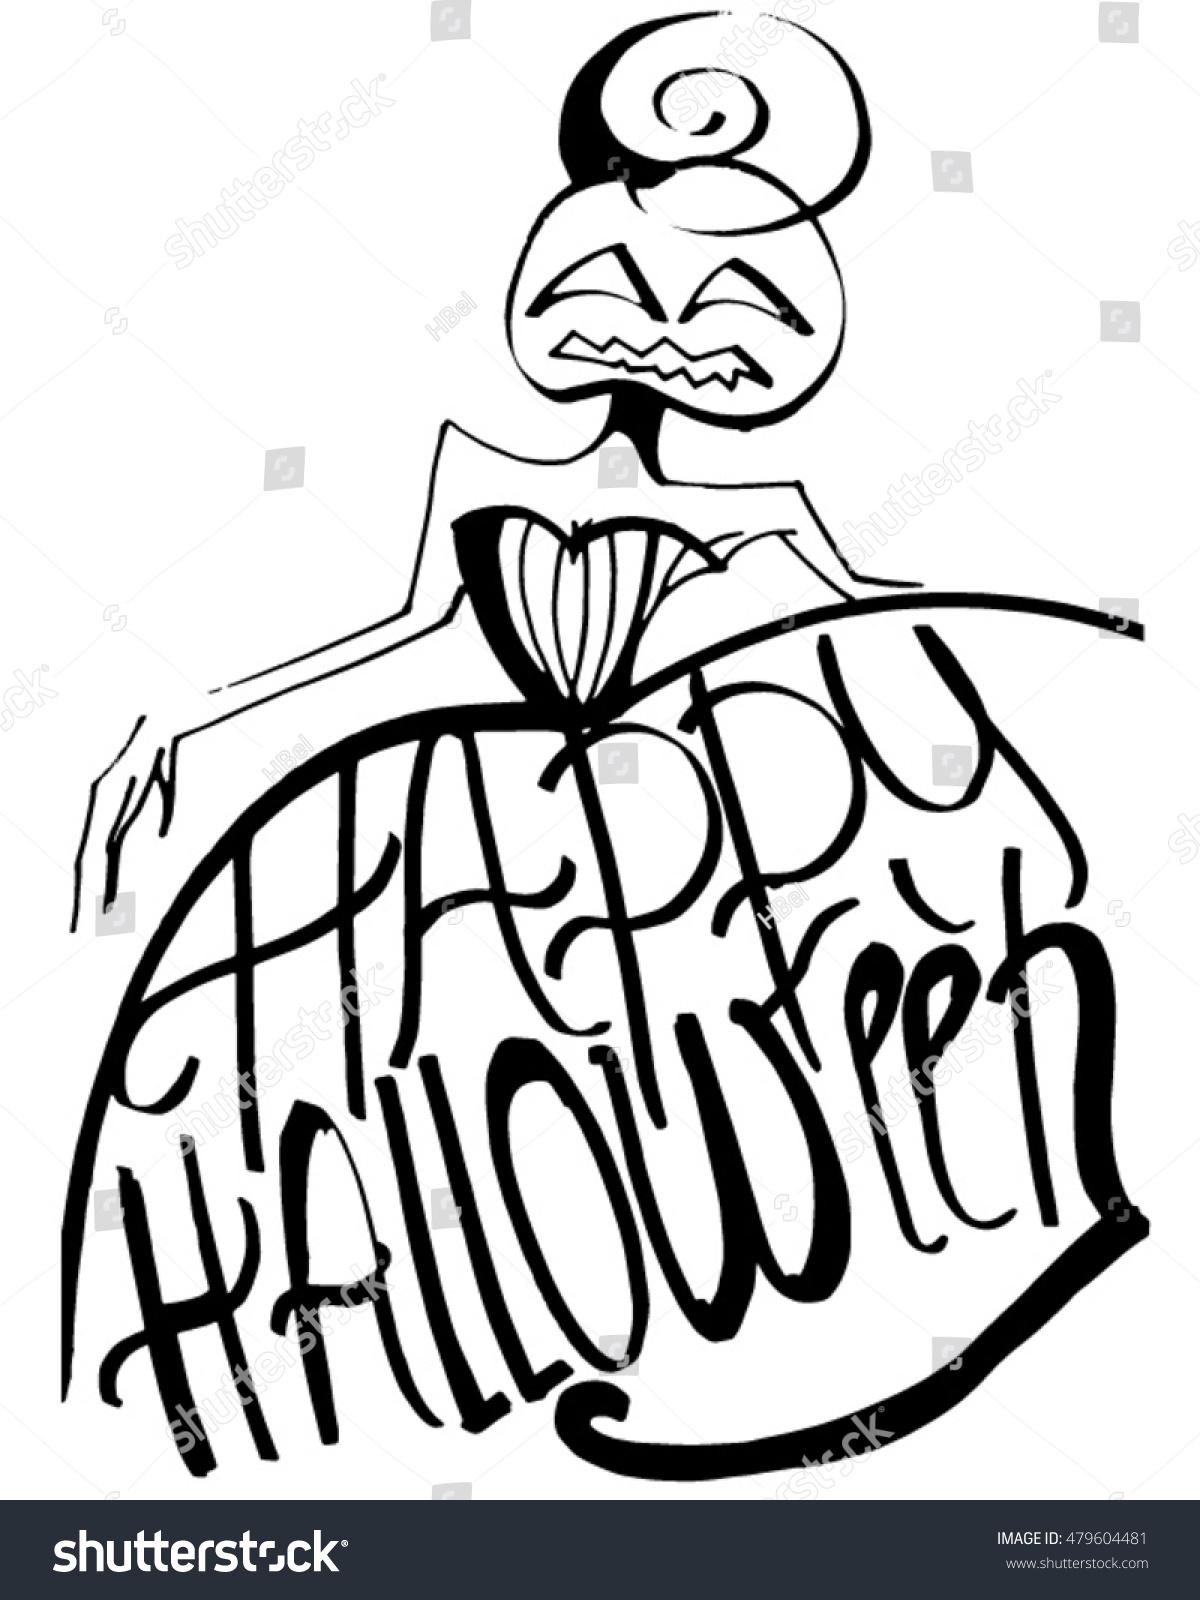 Halloween Party Design Pumpkin Girl Vector Stock Vector 479604481 ...